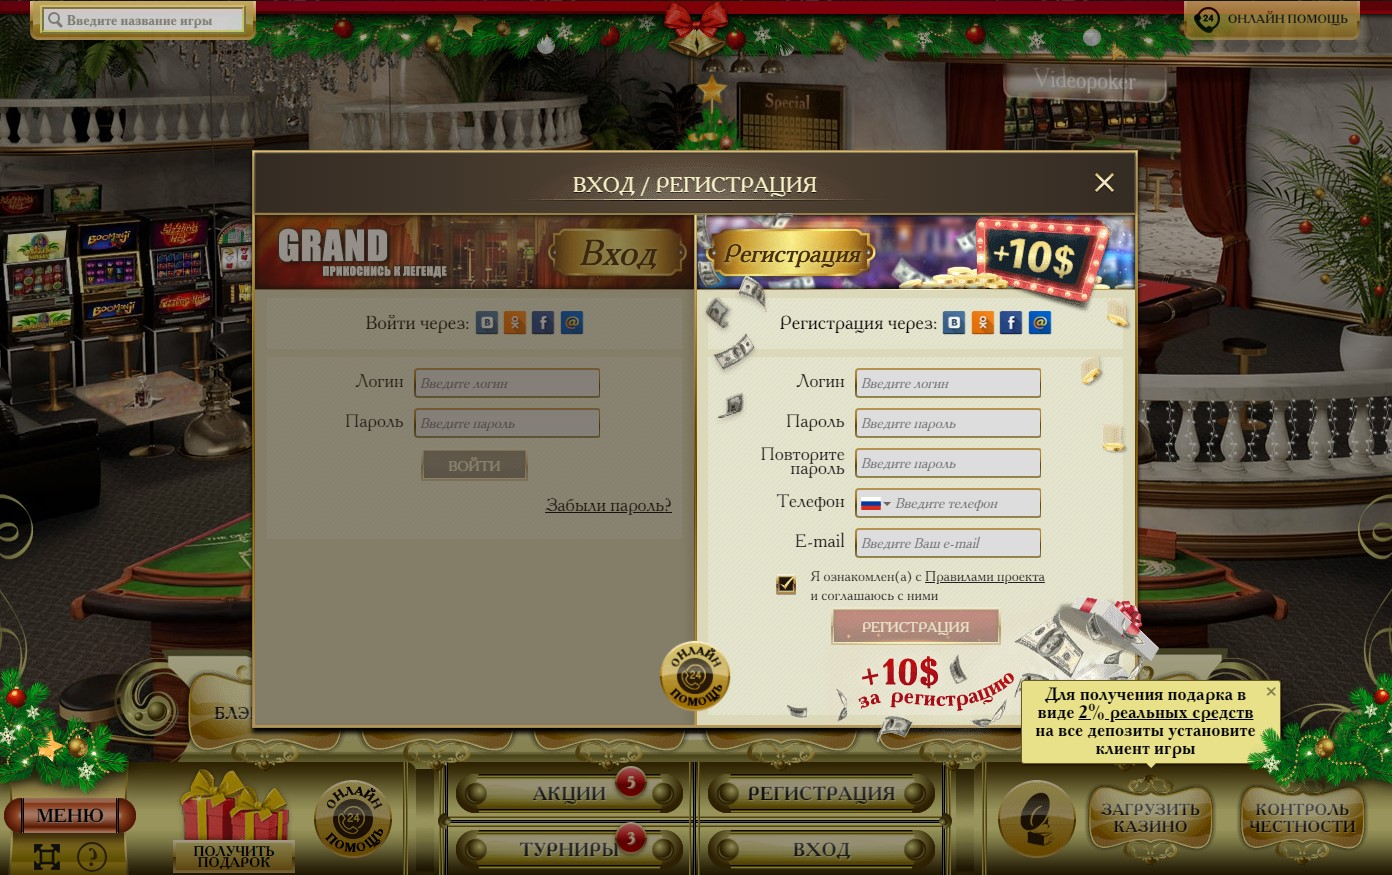 Grand Casino - Официальный сайт